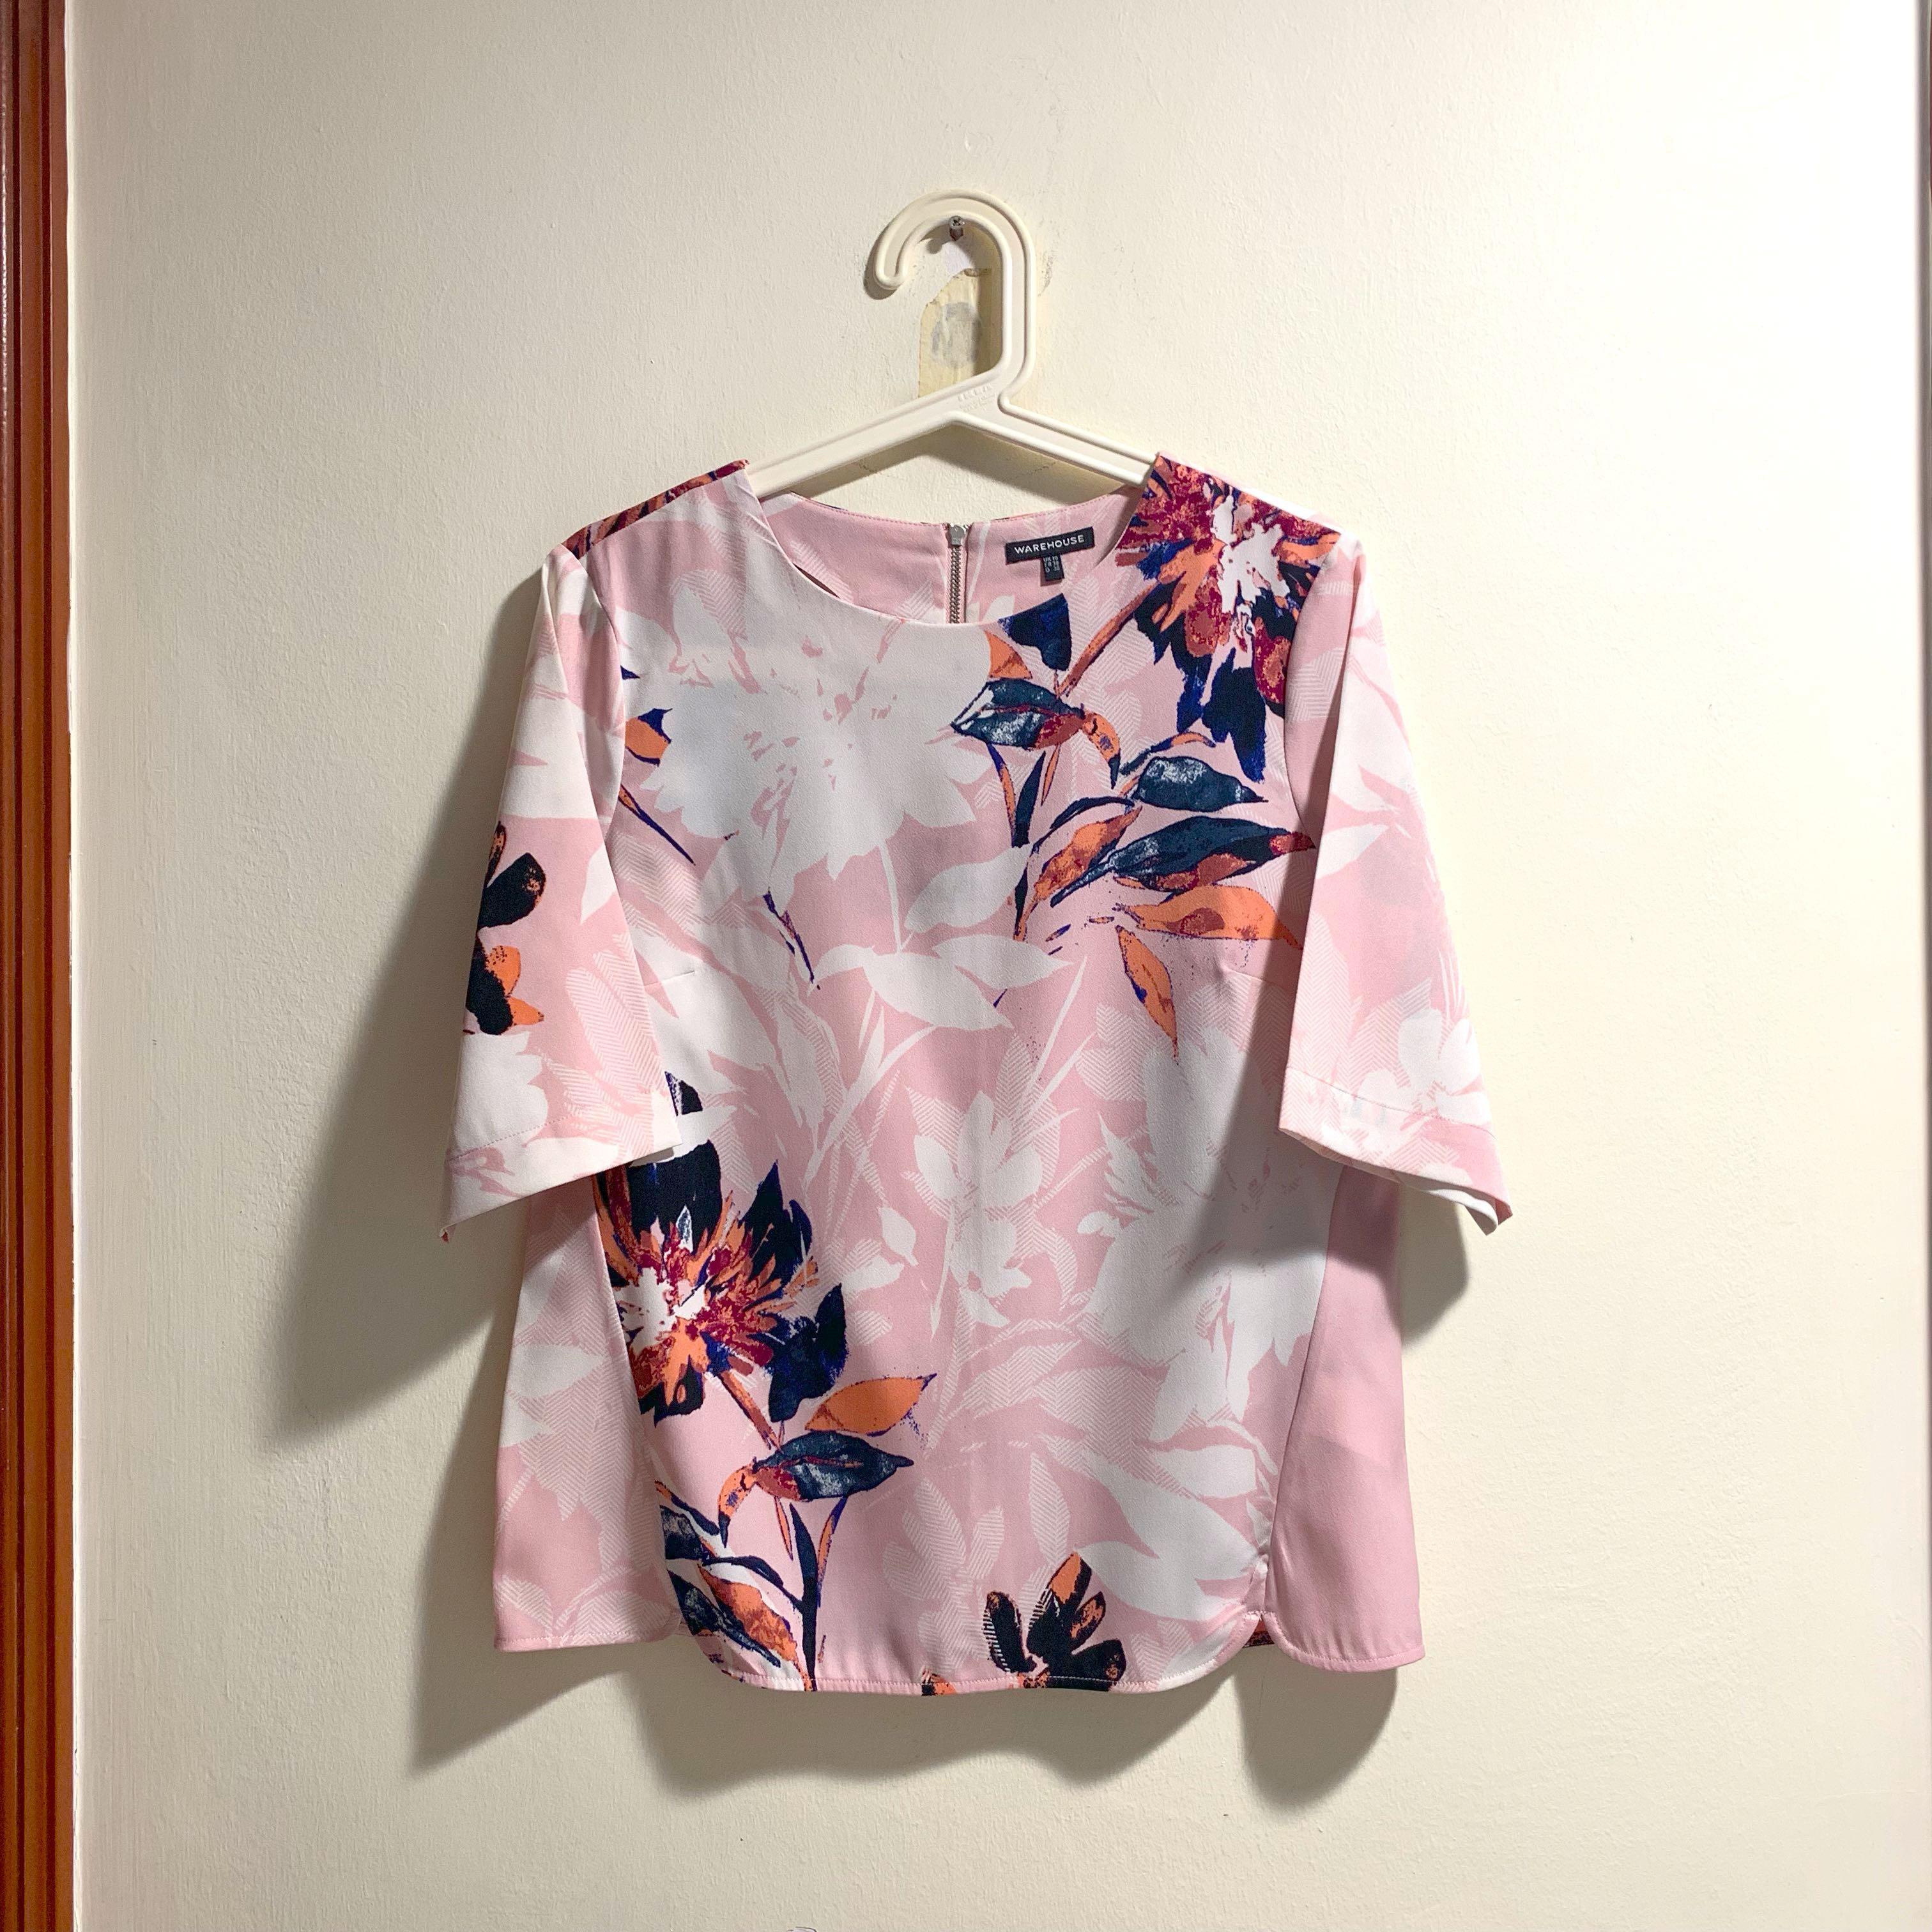 de892cb65 Warehouse floral kimono top, Women's Fashion, Clothes, Tops on Carousell